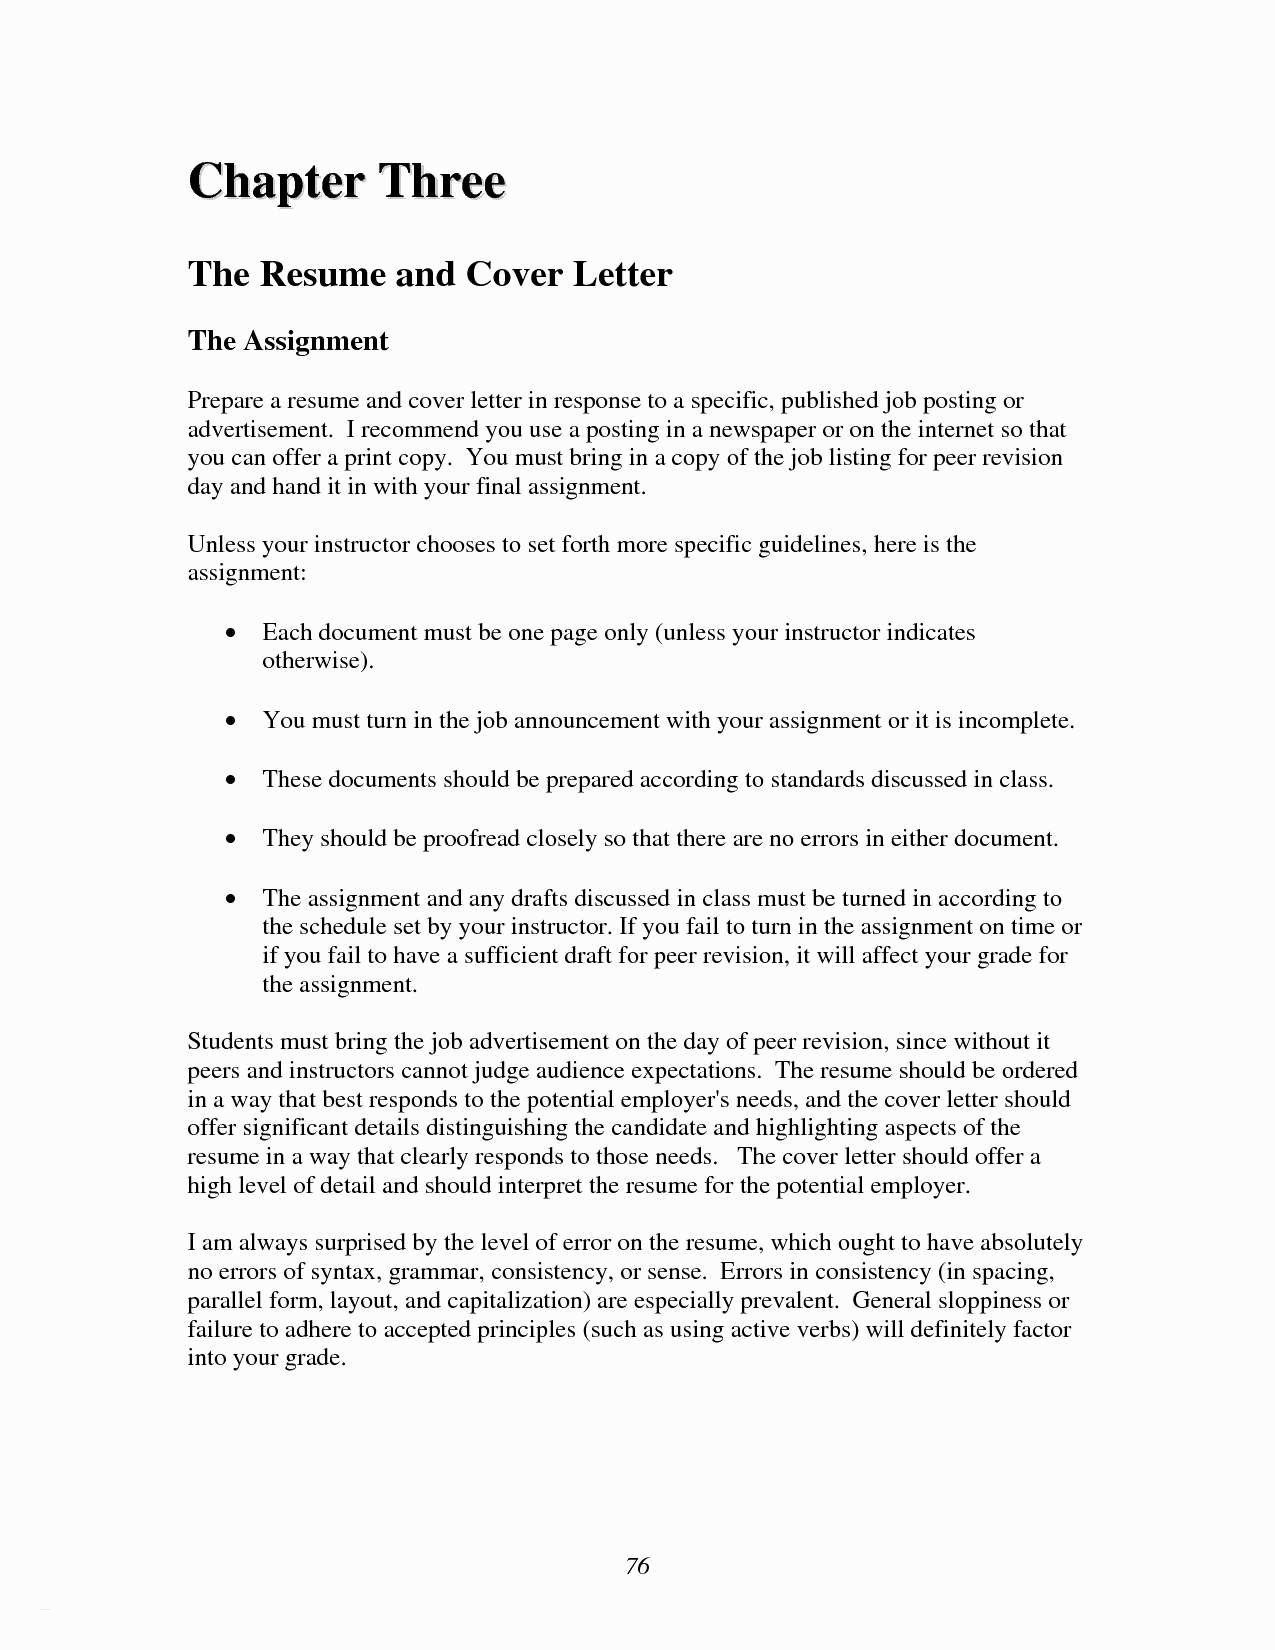 General Cover Letter Template - General Cover Letter for Resume New Fresh Job Fer Letter Template Us